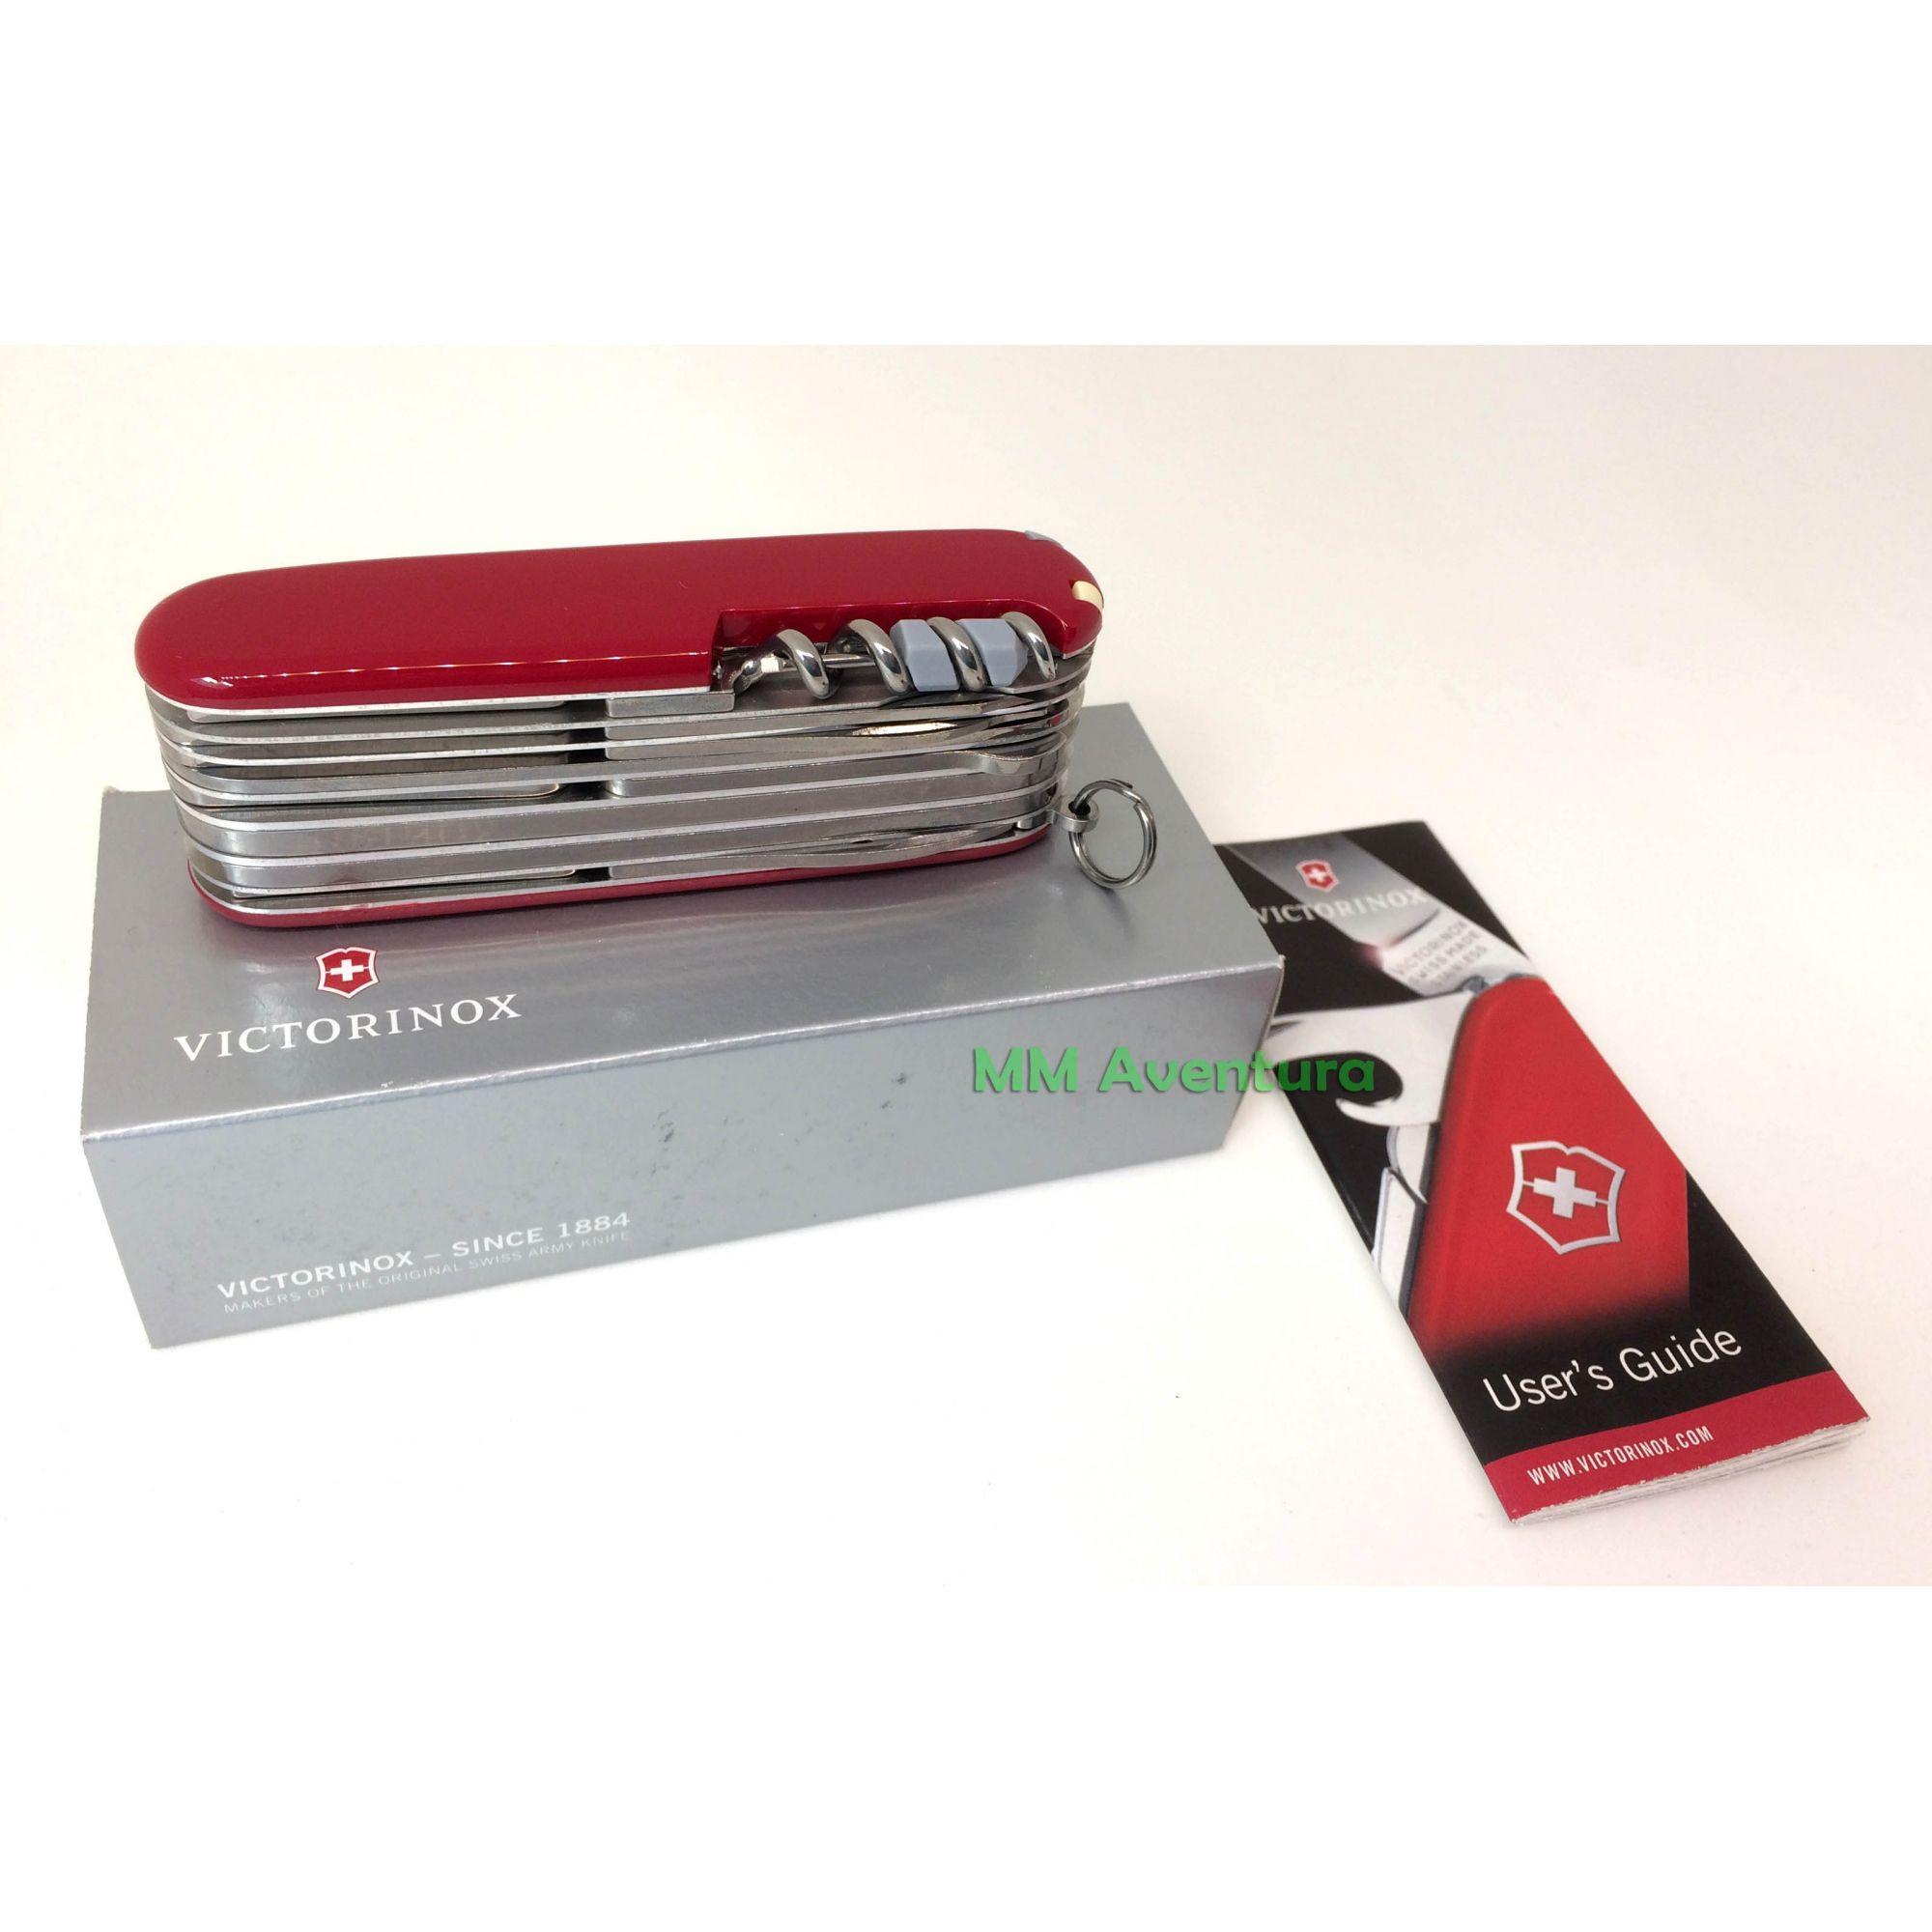 Canivete Victorinox Swisschamp Vermelho Suiço 1.6795